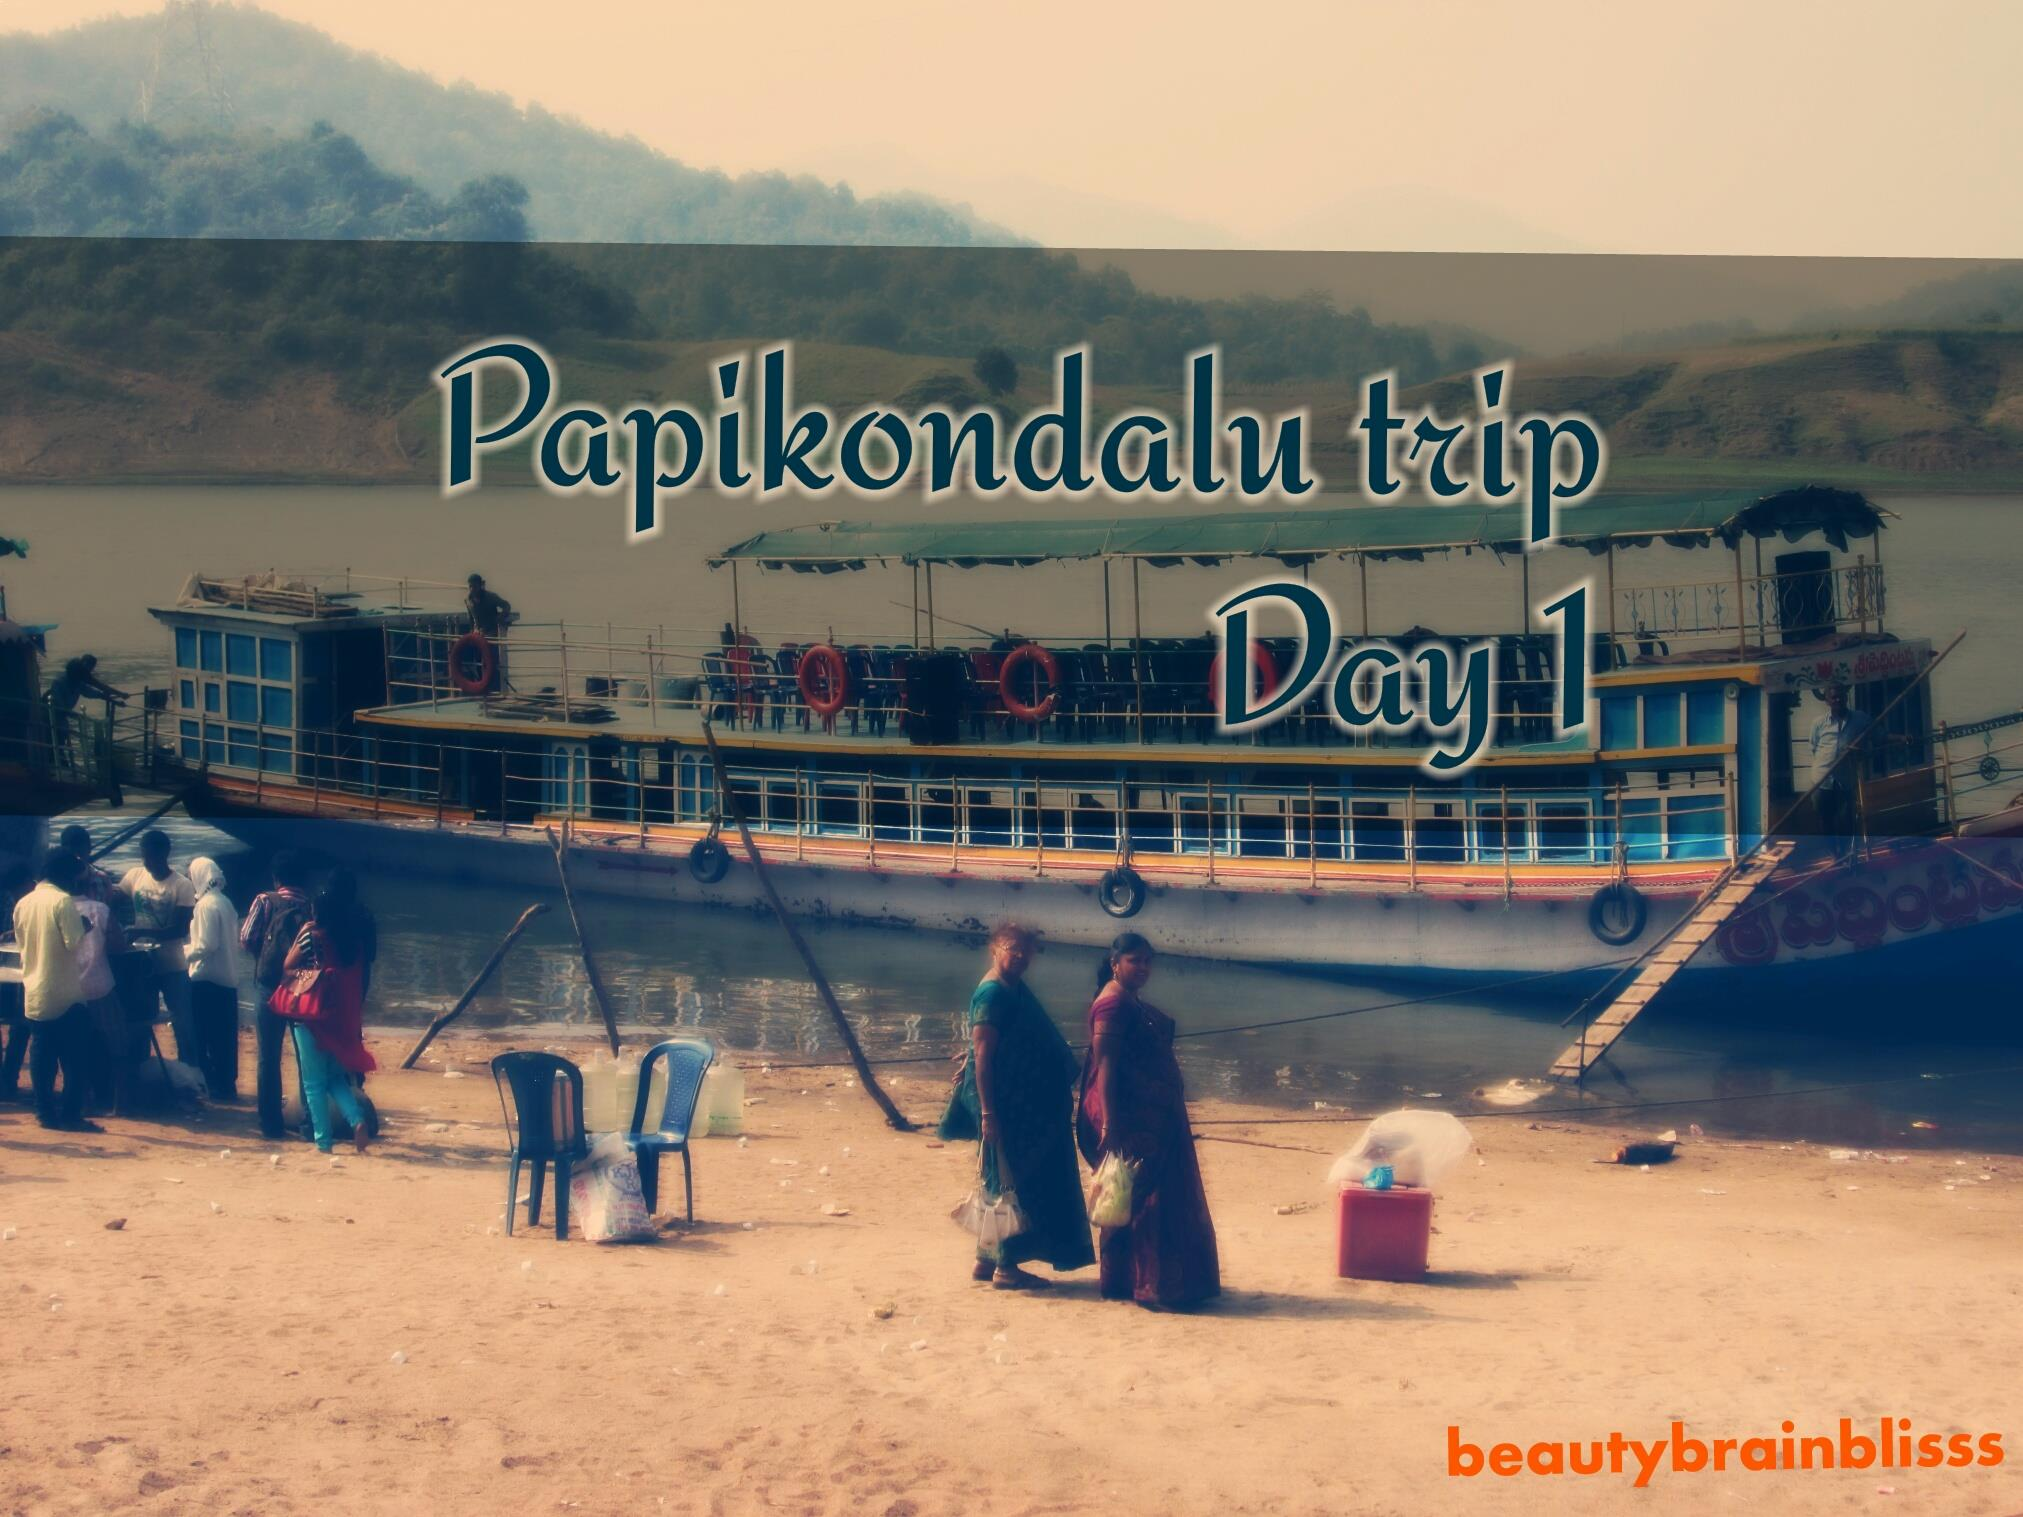 Papikondalu trip,day 1